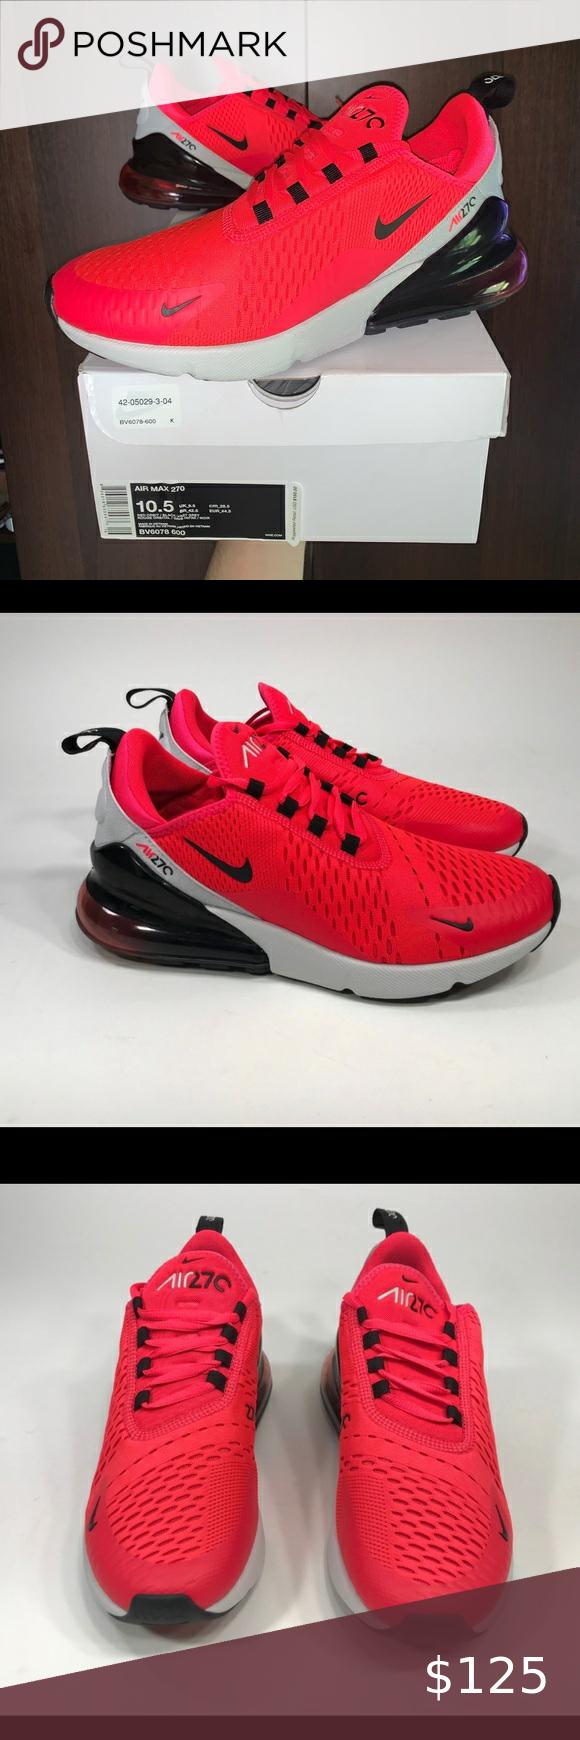 New ! Nike Air Max 270 \